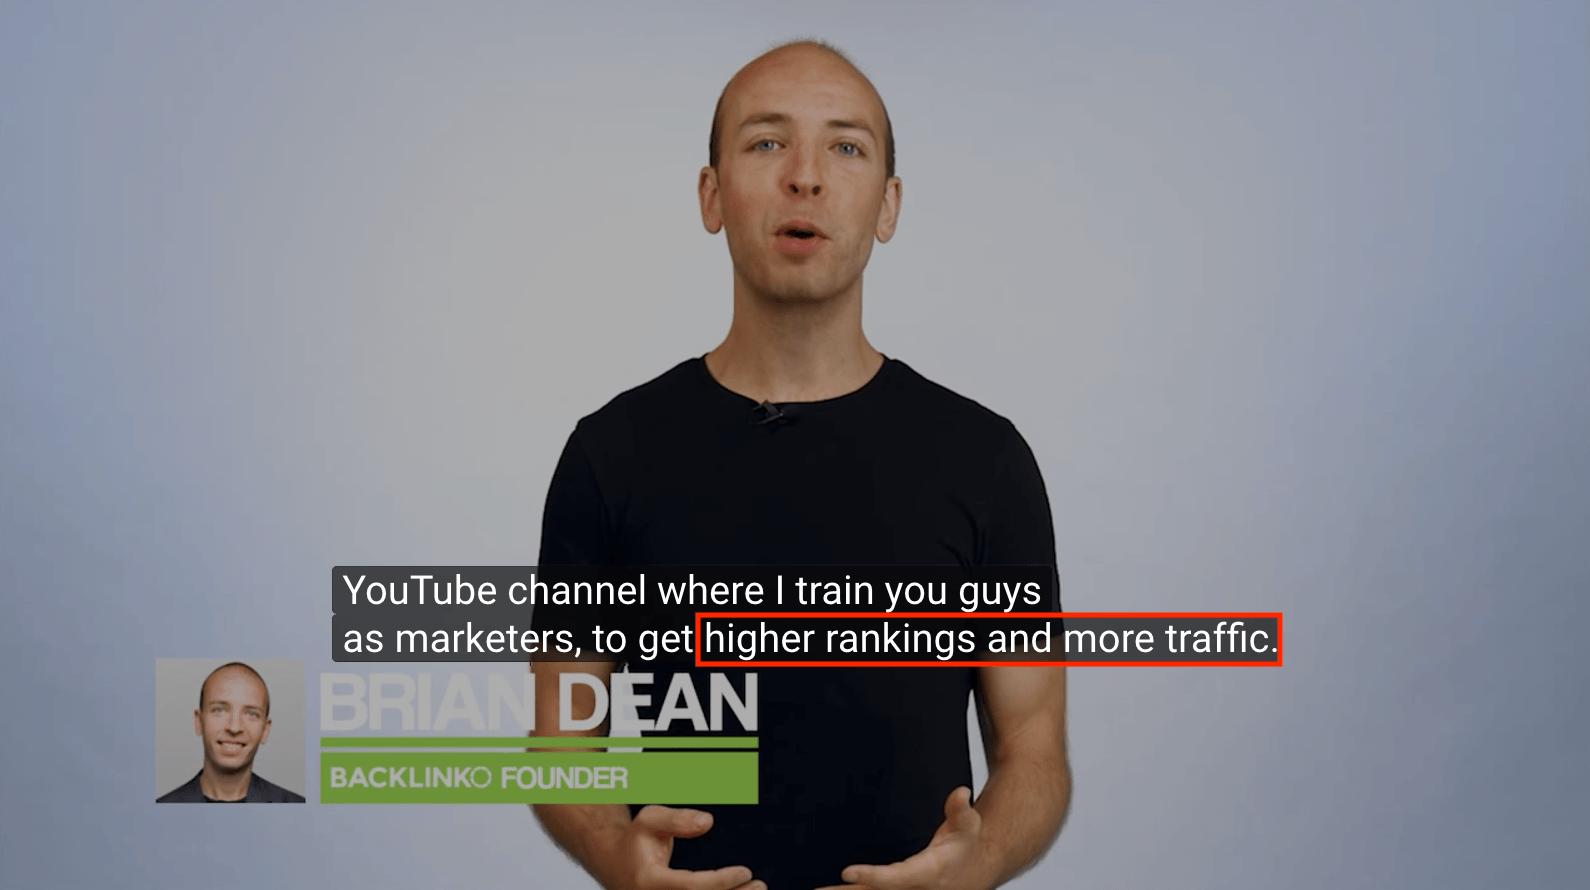 Say tagline in channel trailer